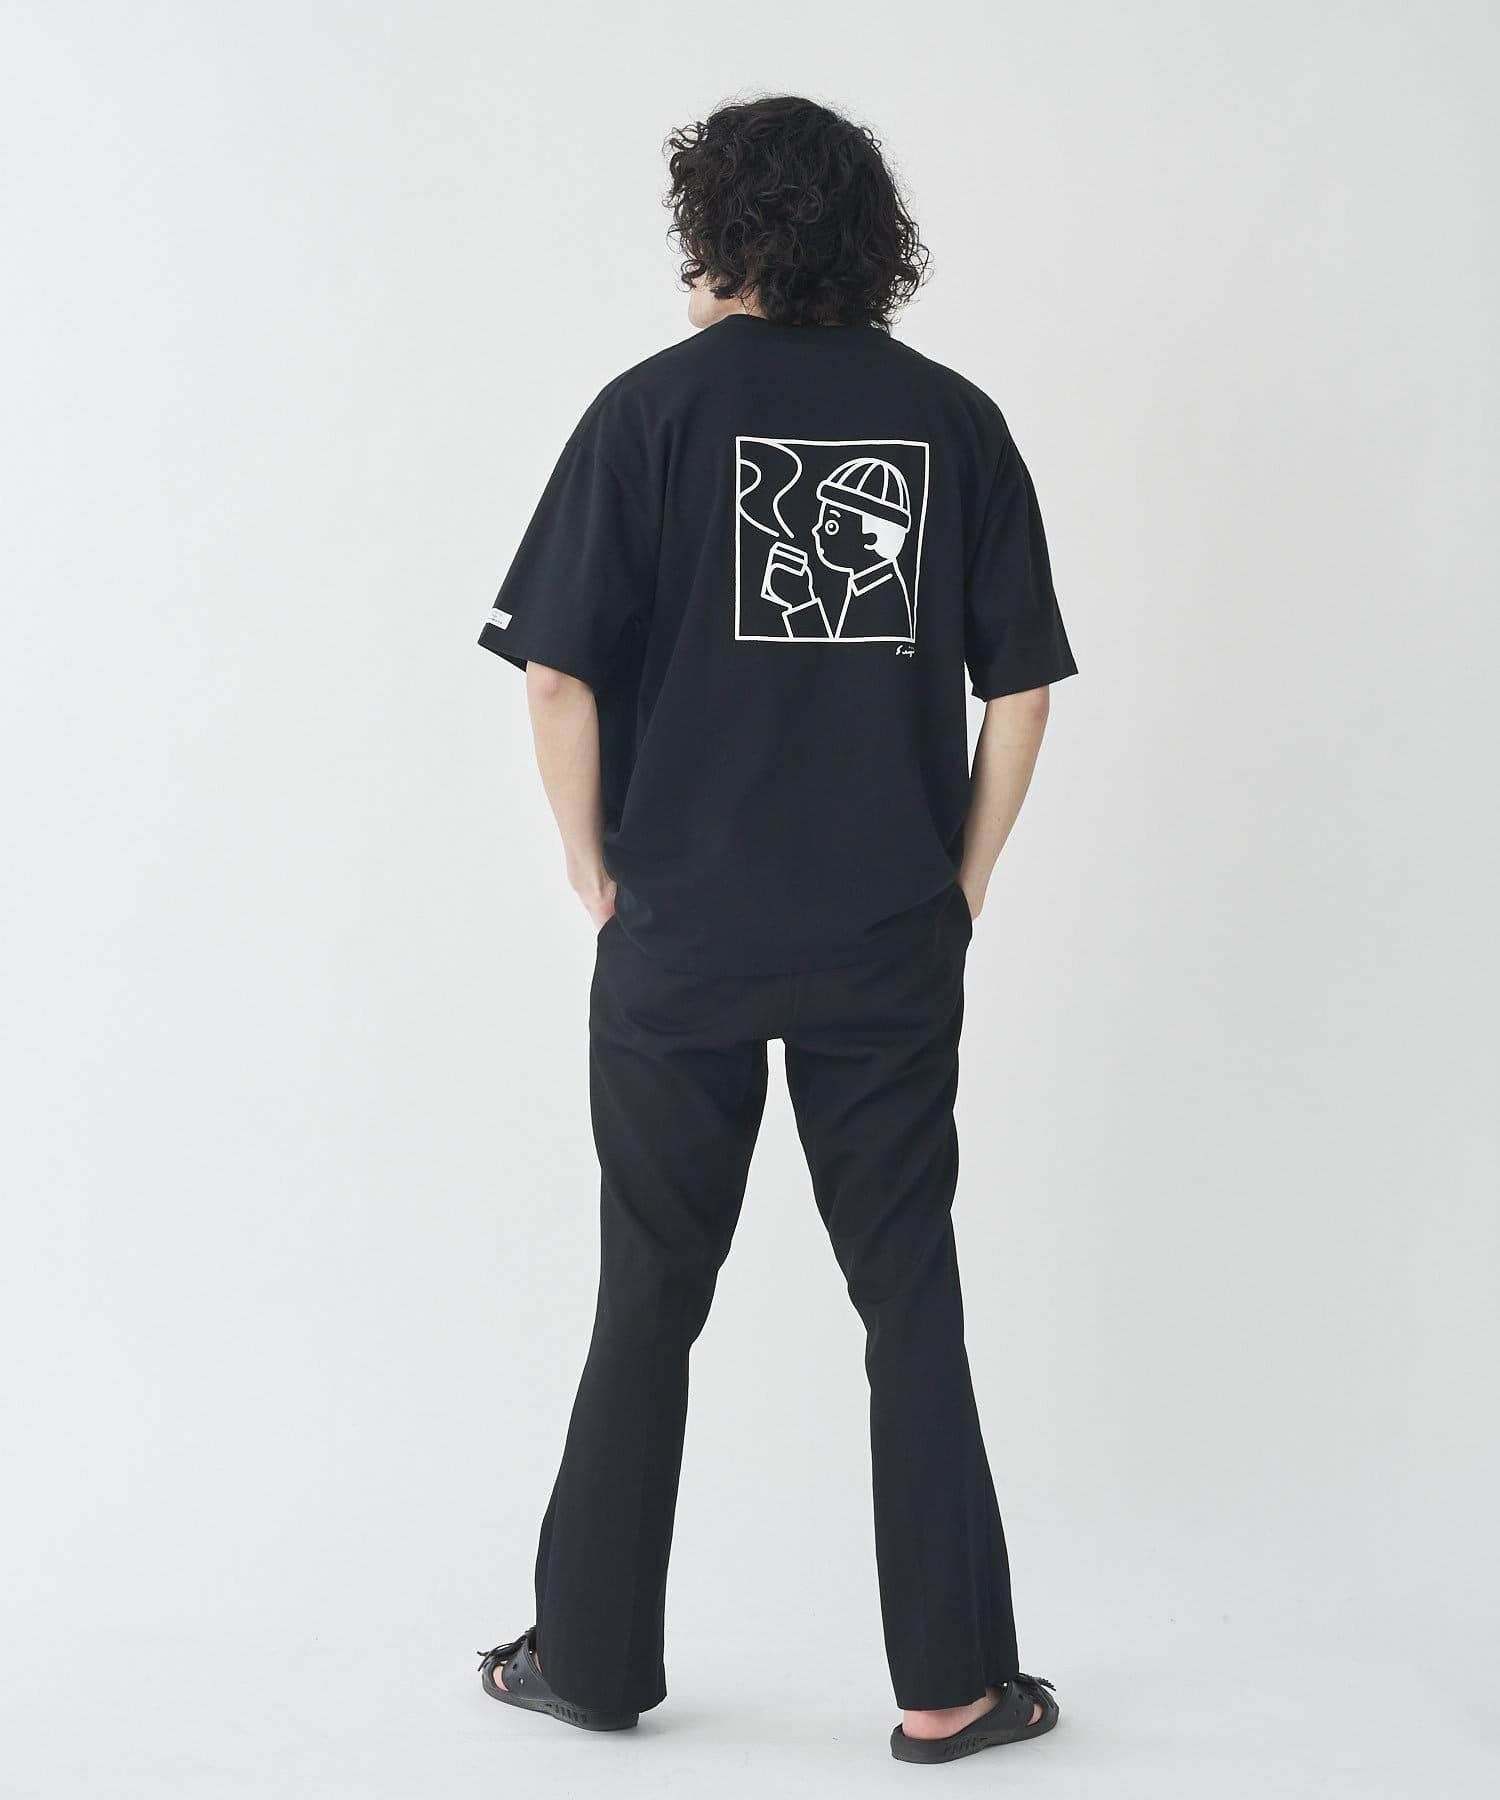 CPCM(シーピーシーエム) 【WEB限定】SEIJI MATSUMOTO×CPCM バックプリントBIGT